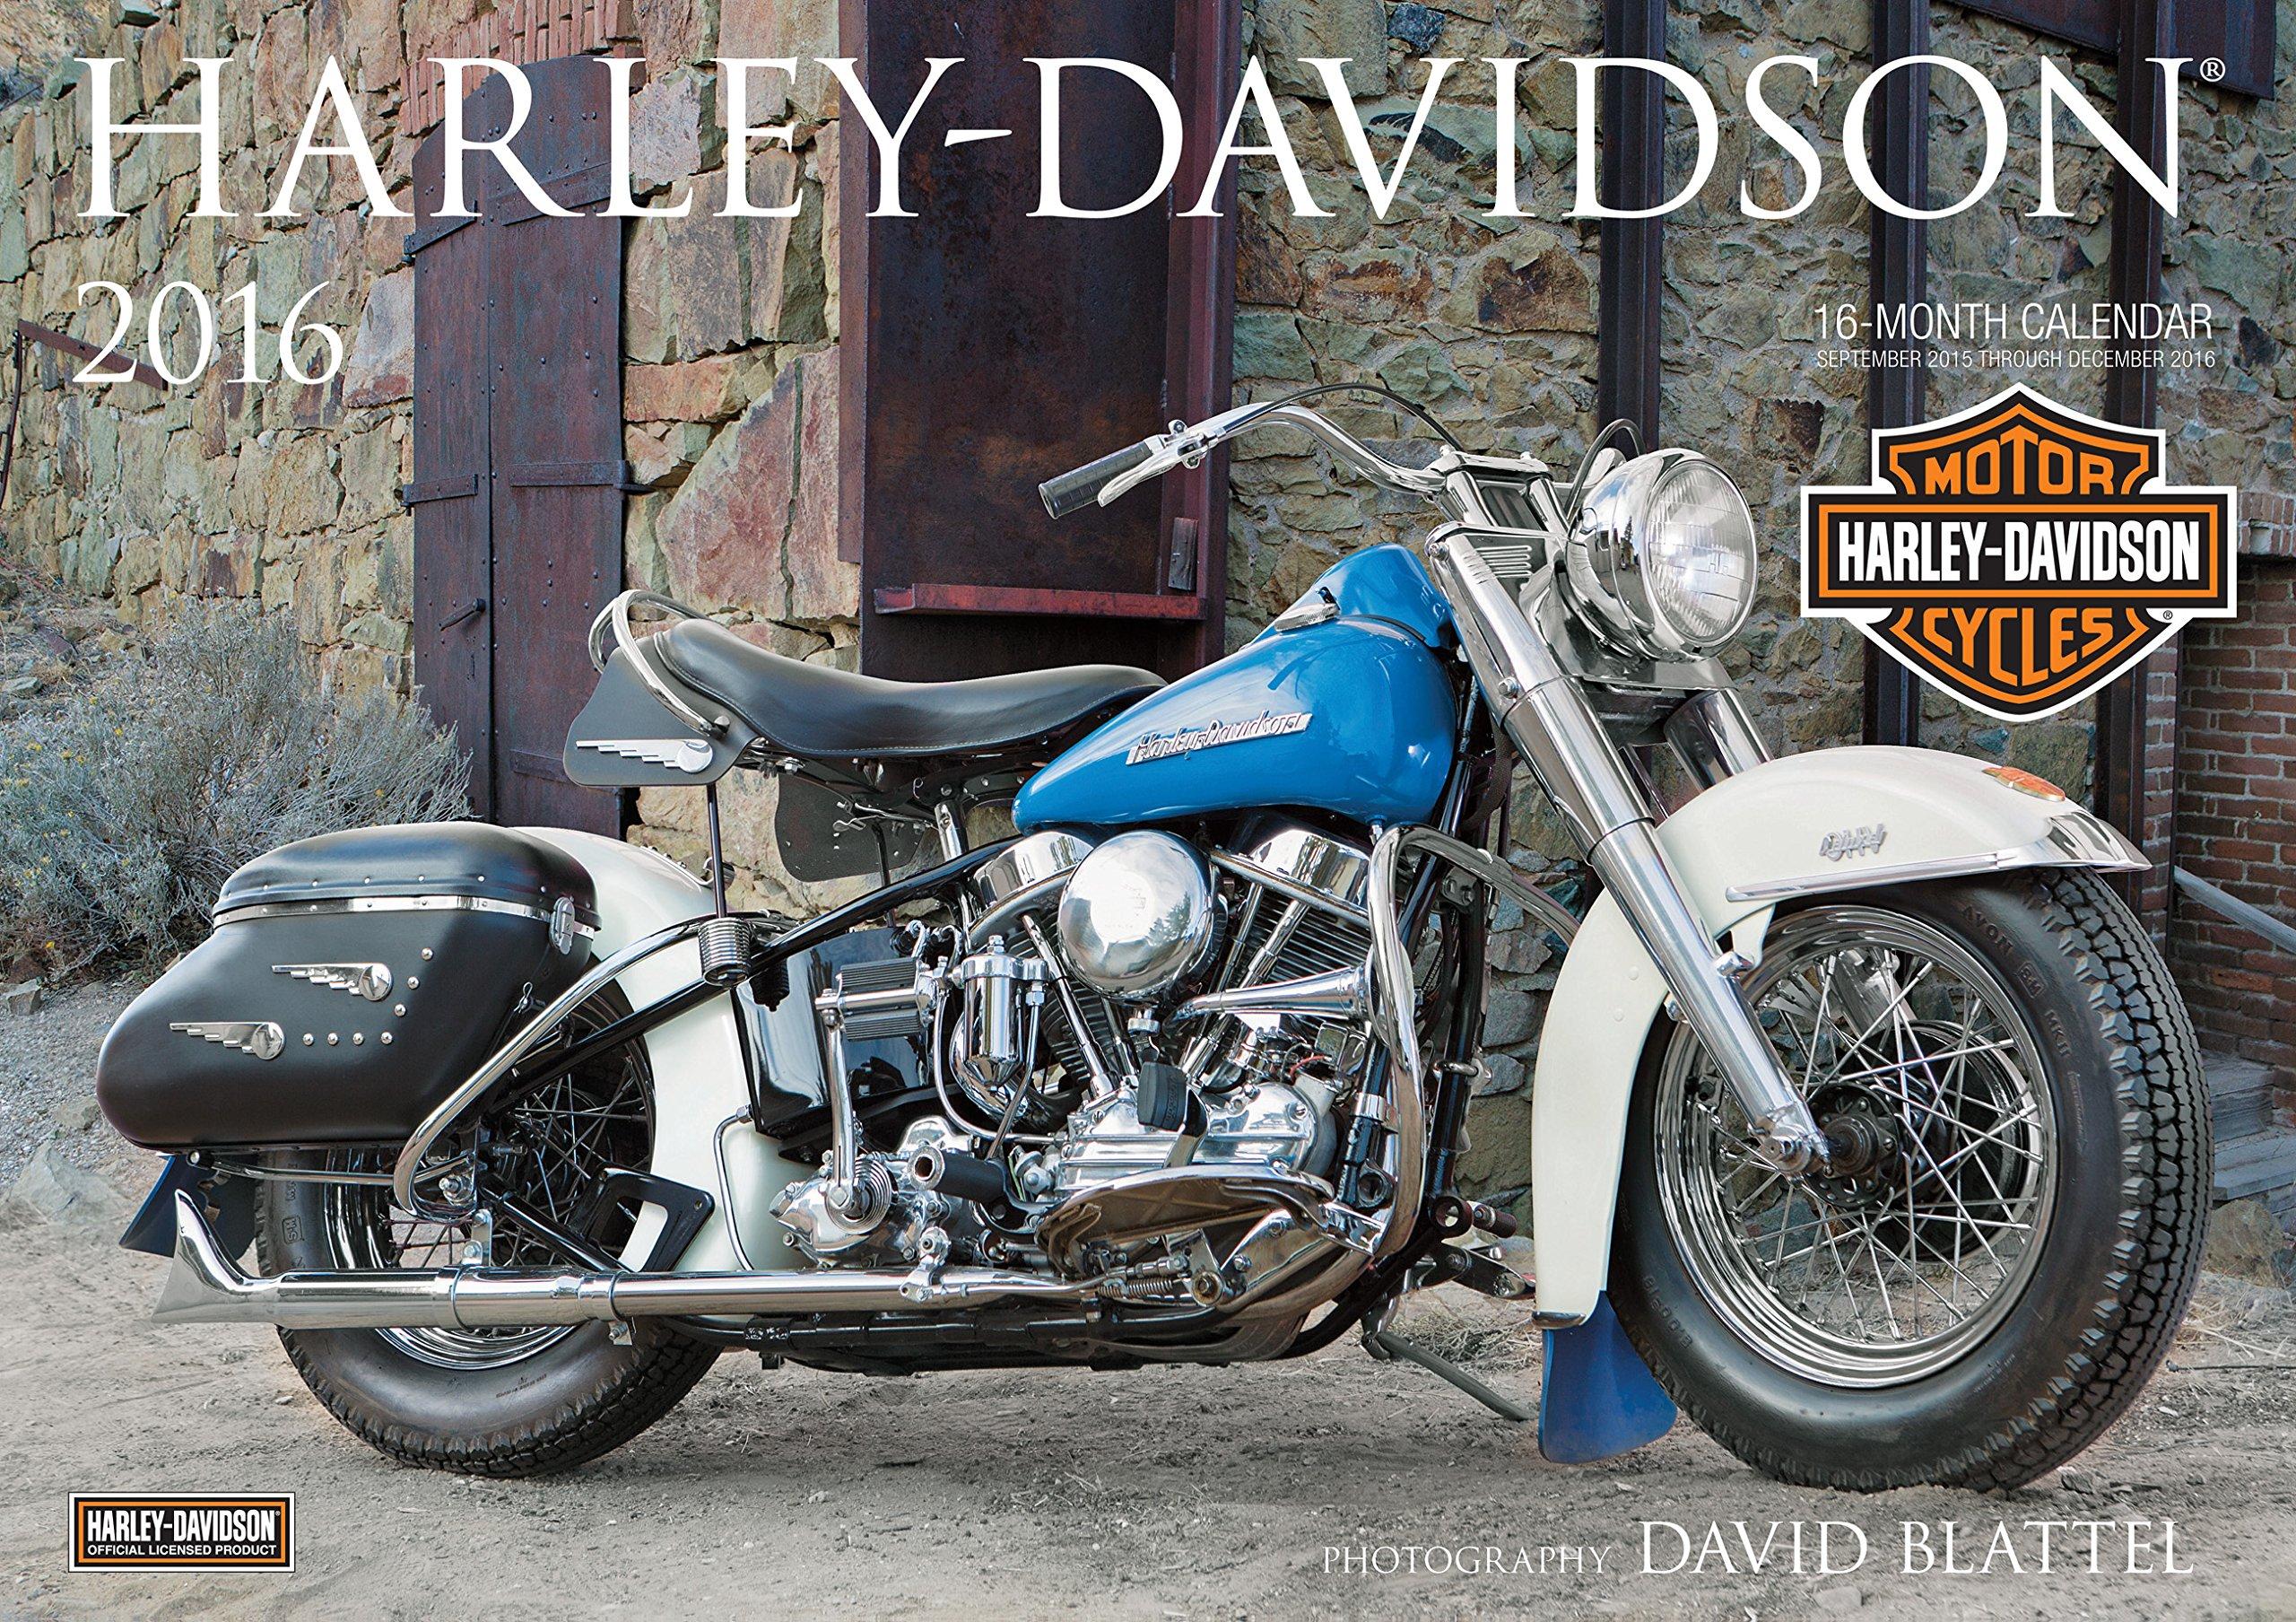 Harley-Davidson(R) 2016: 16-Month Calendar September 2015 through December 2016 pdf epub